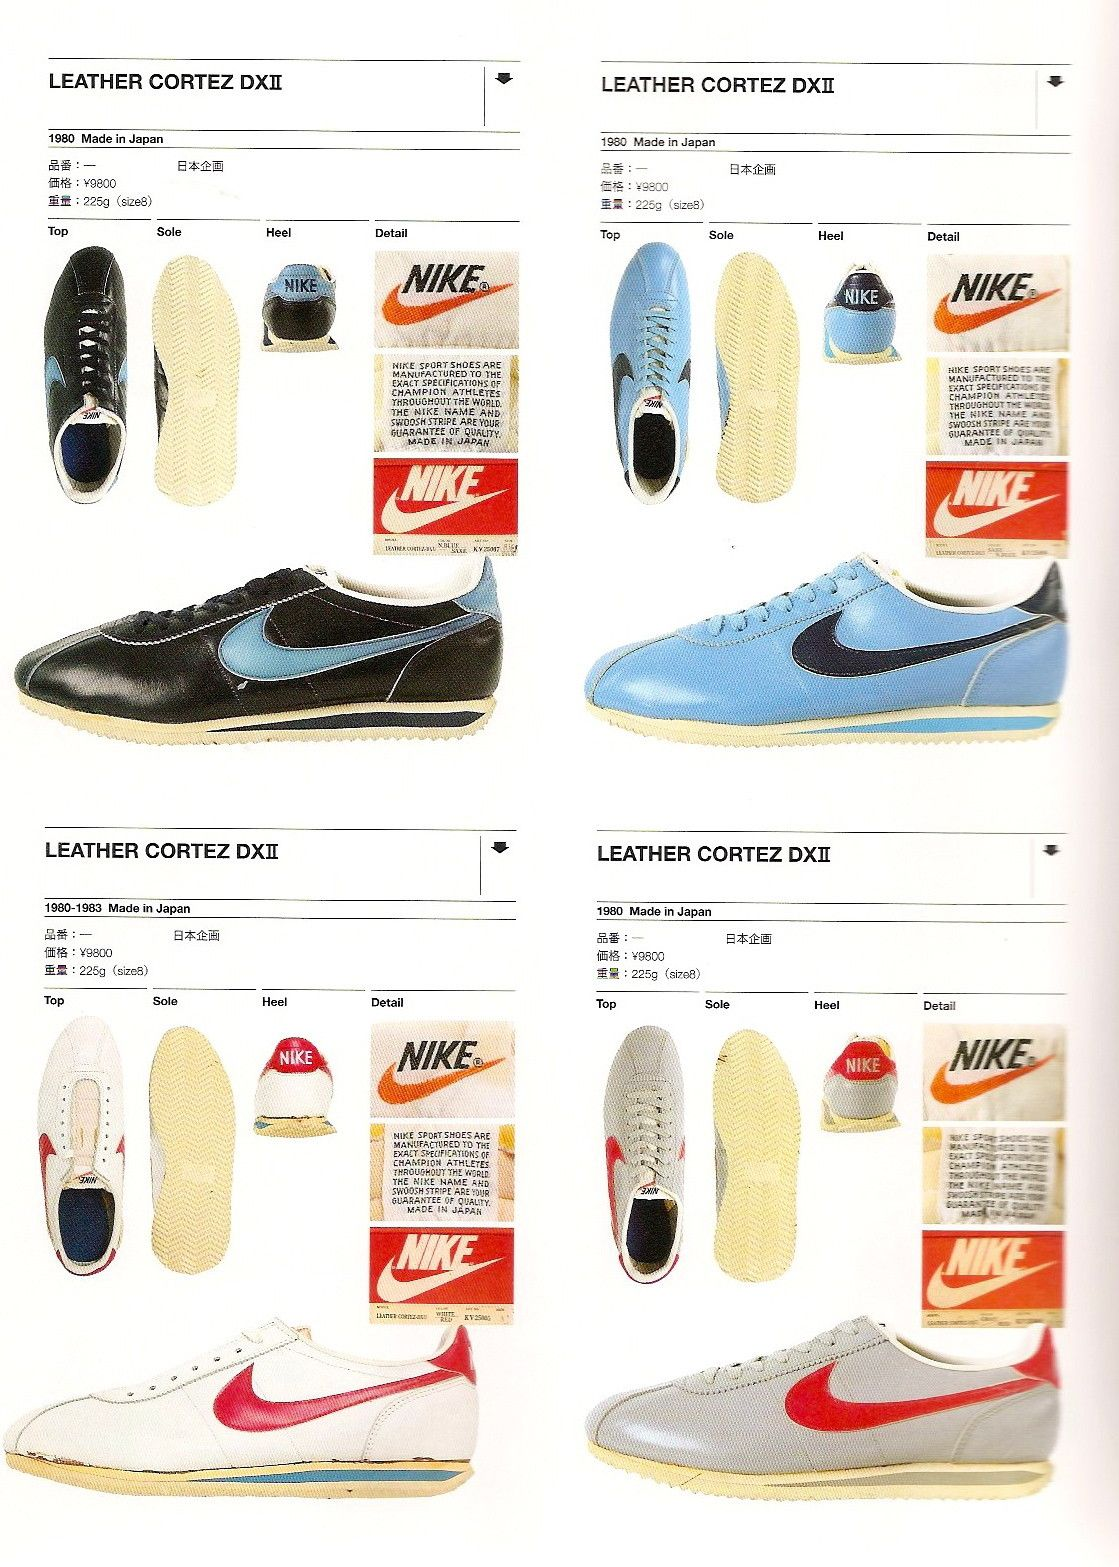 2bd327a0e0f6 Nike Leather Cortez DXII 1980   Running   Vintage Nike - Arkamix   Nike